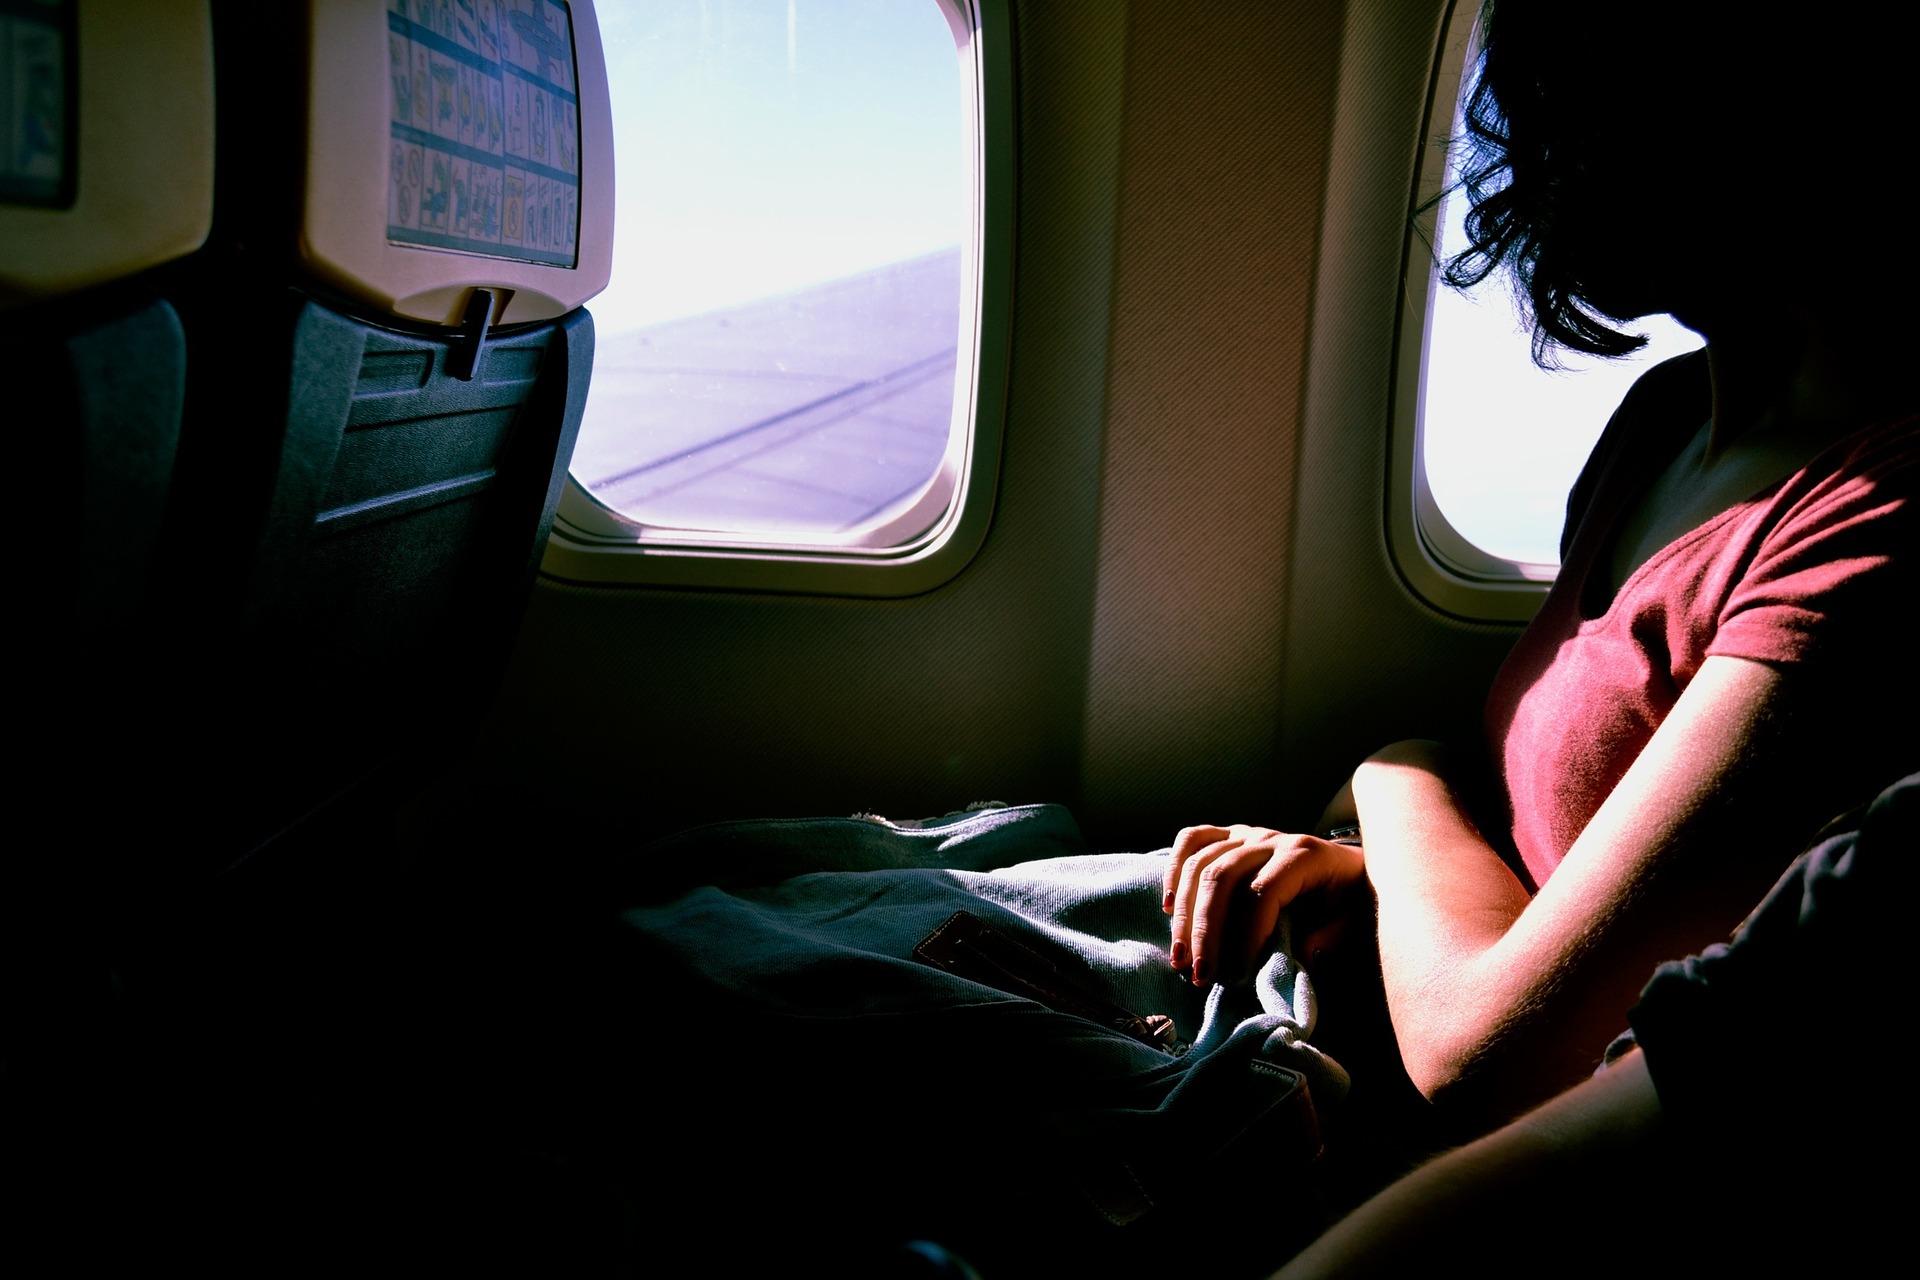 airplane-1209752_1920.jpg